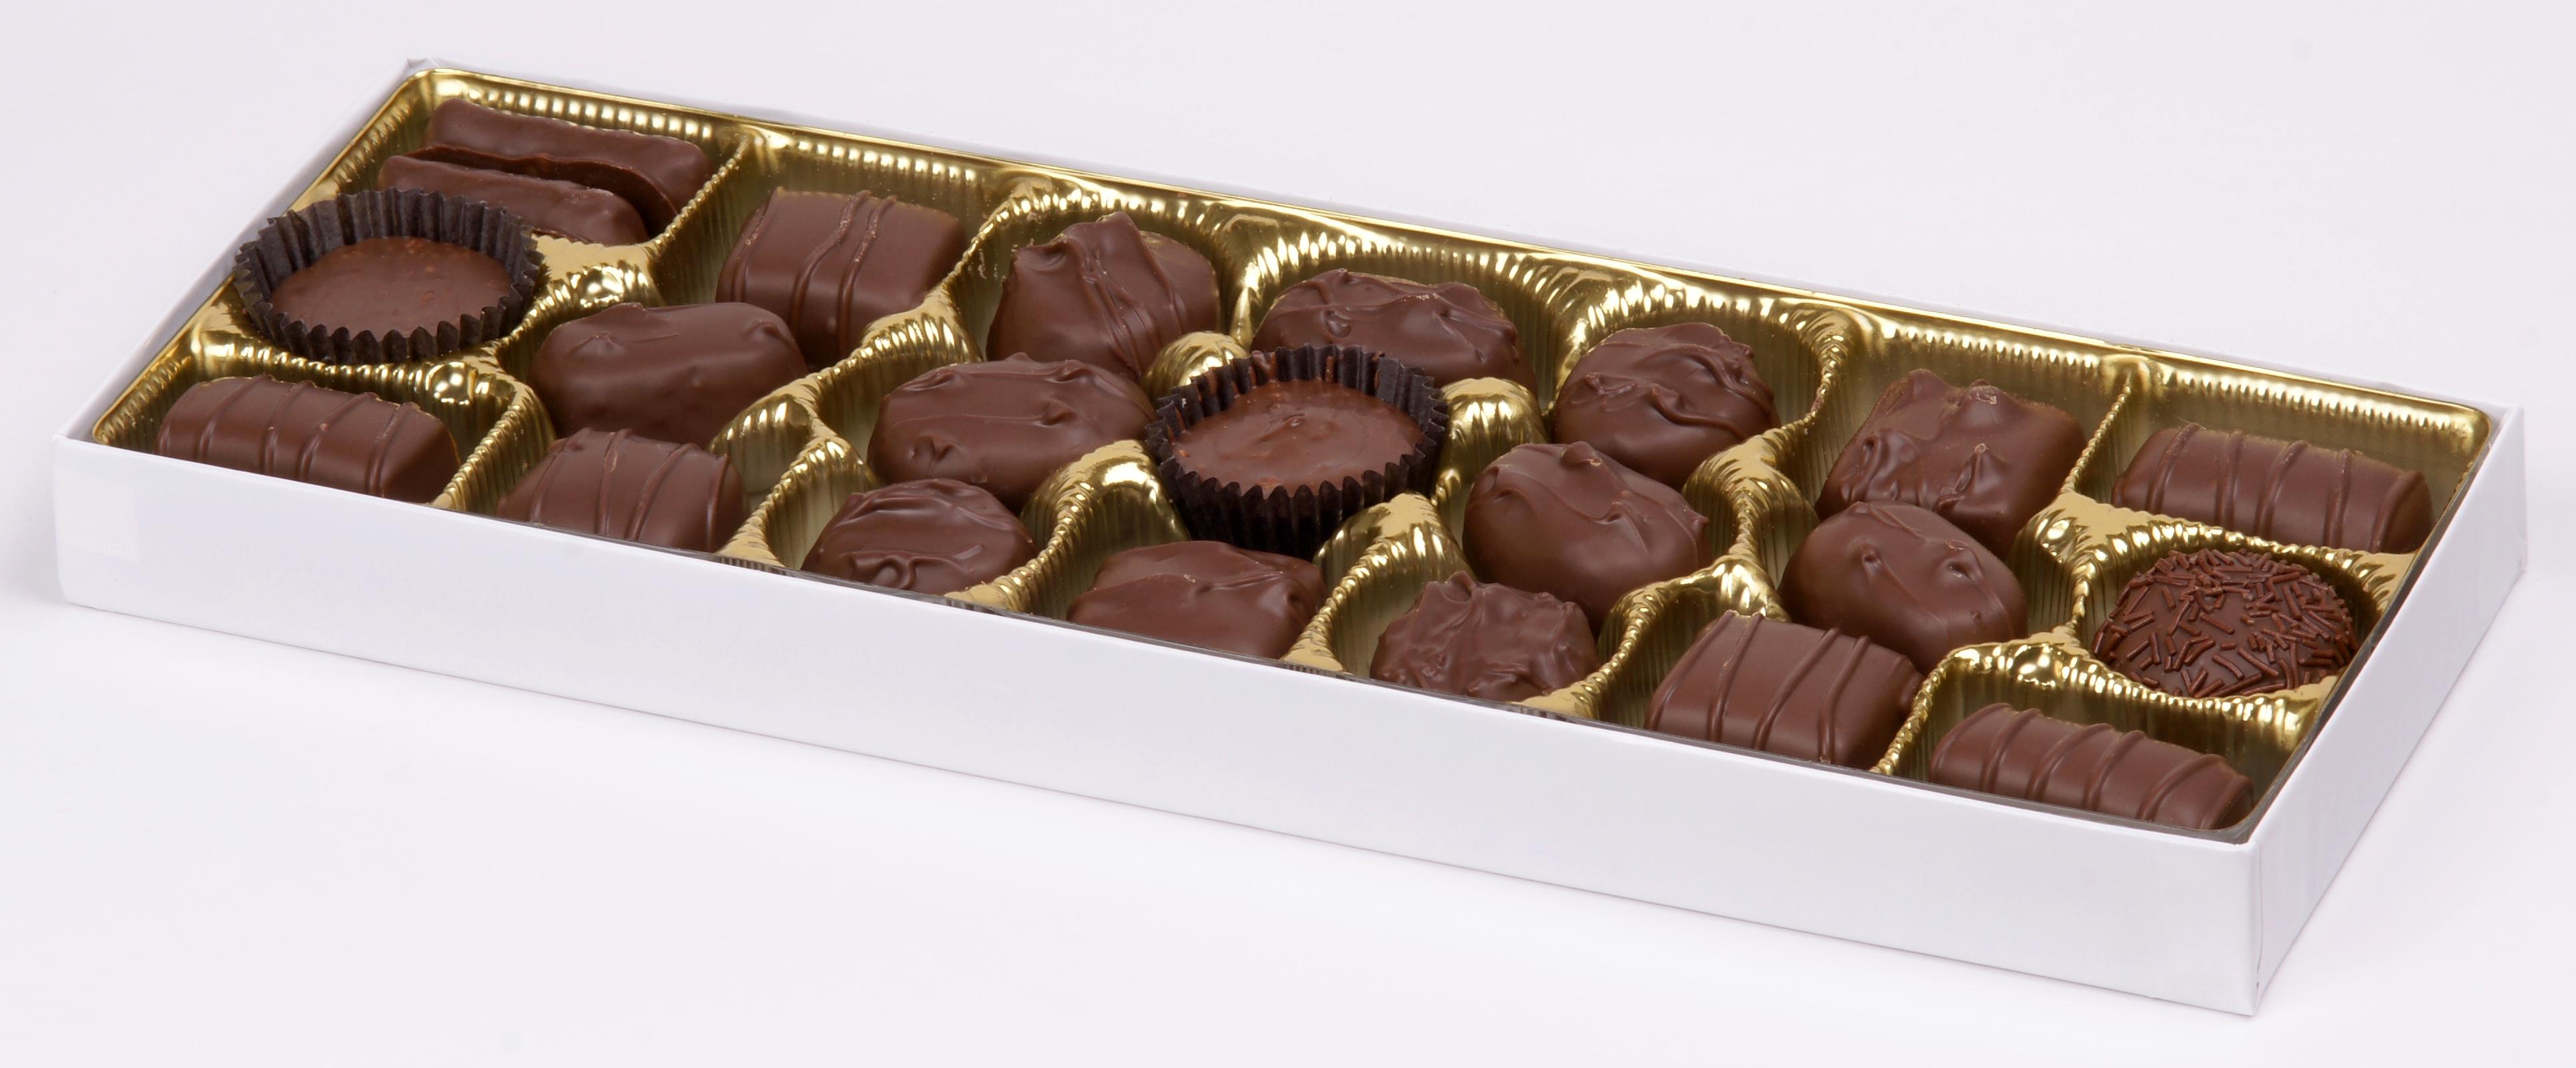 chocolates - photo #41